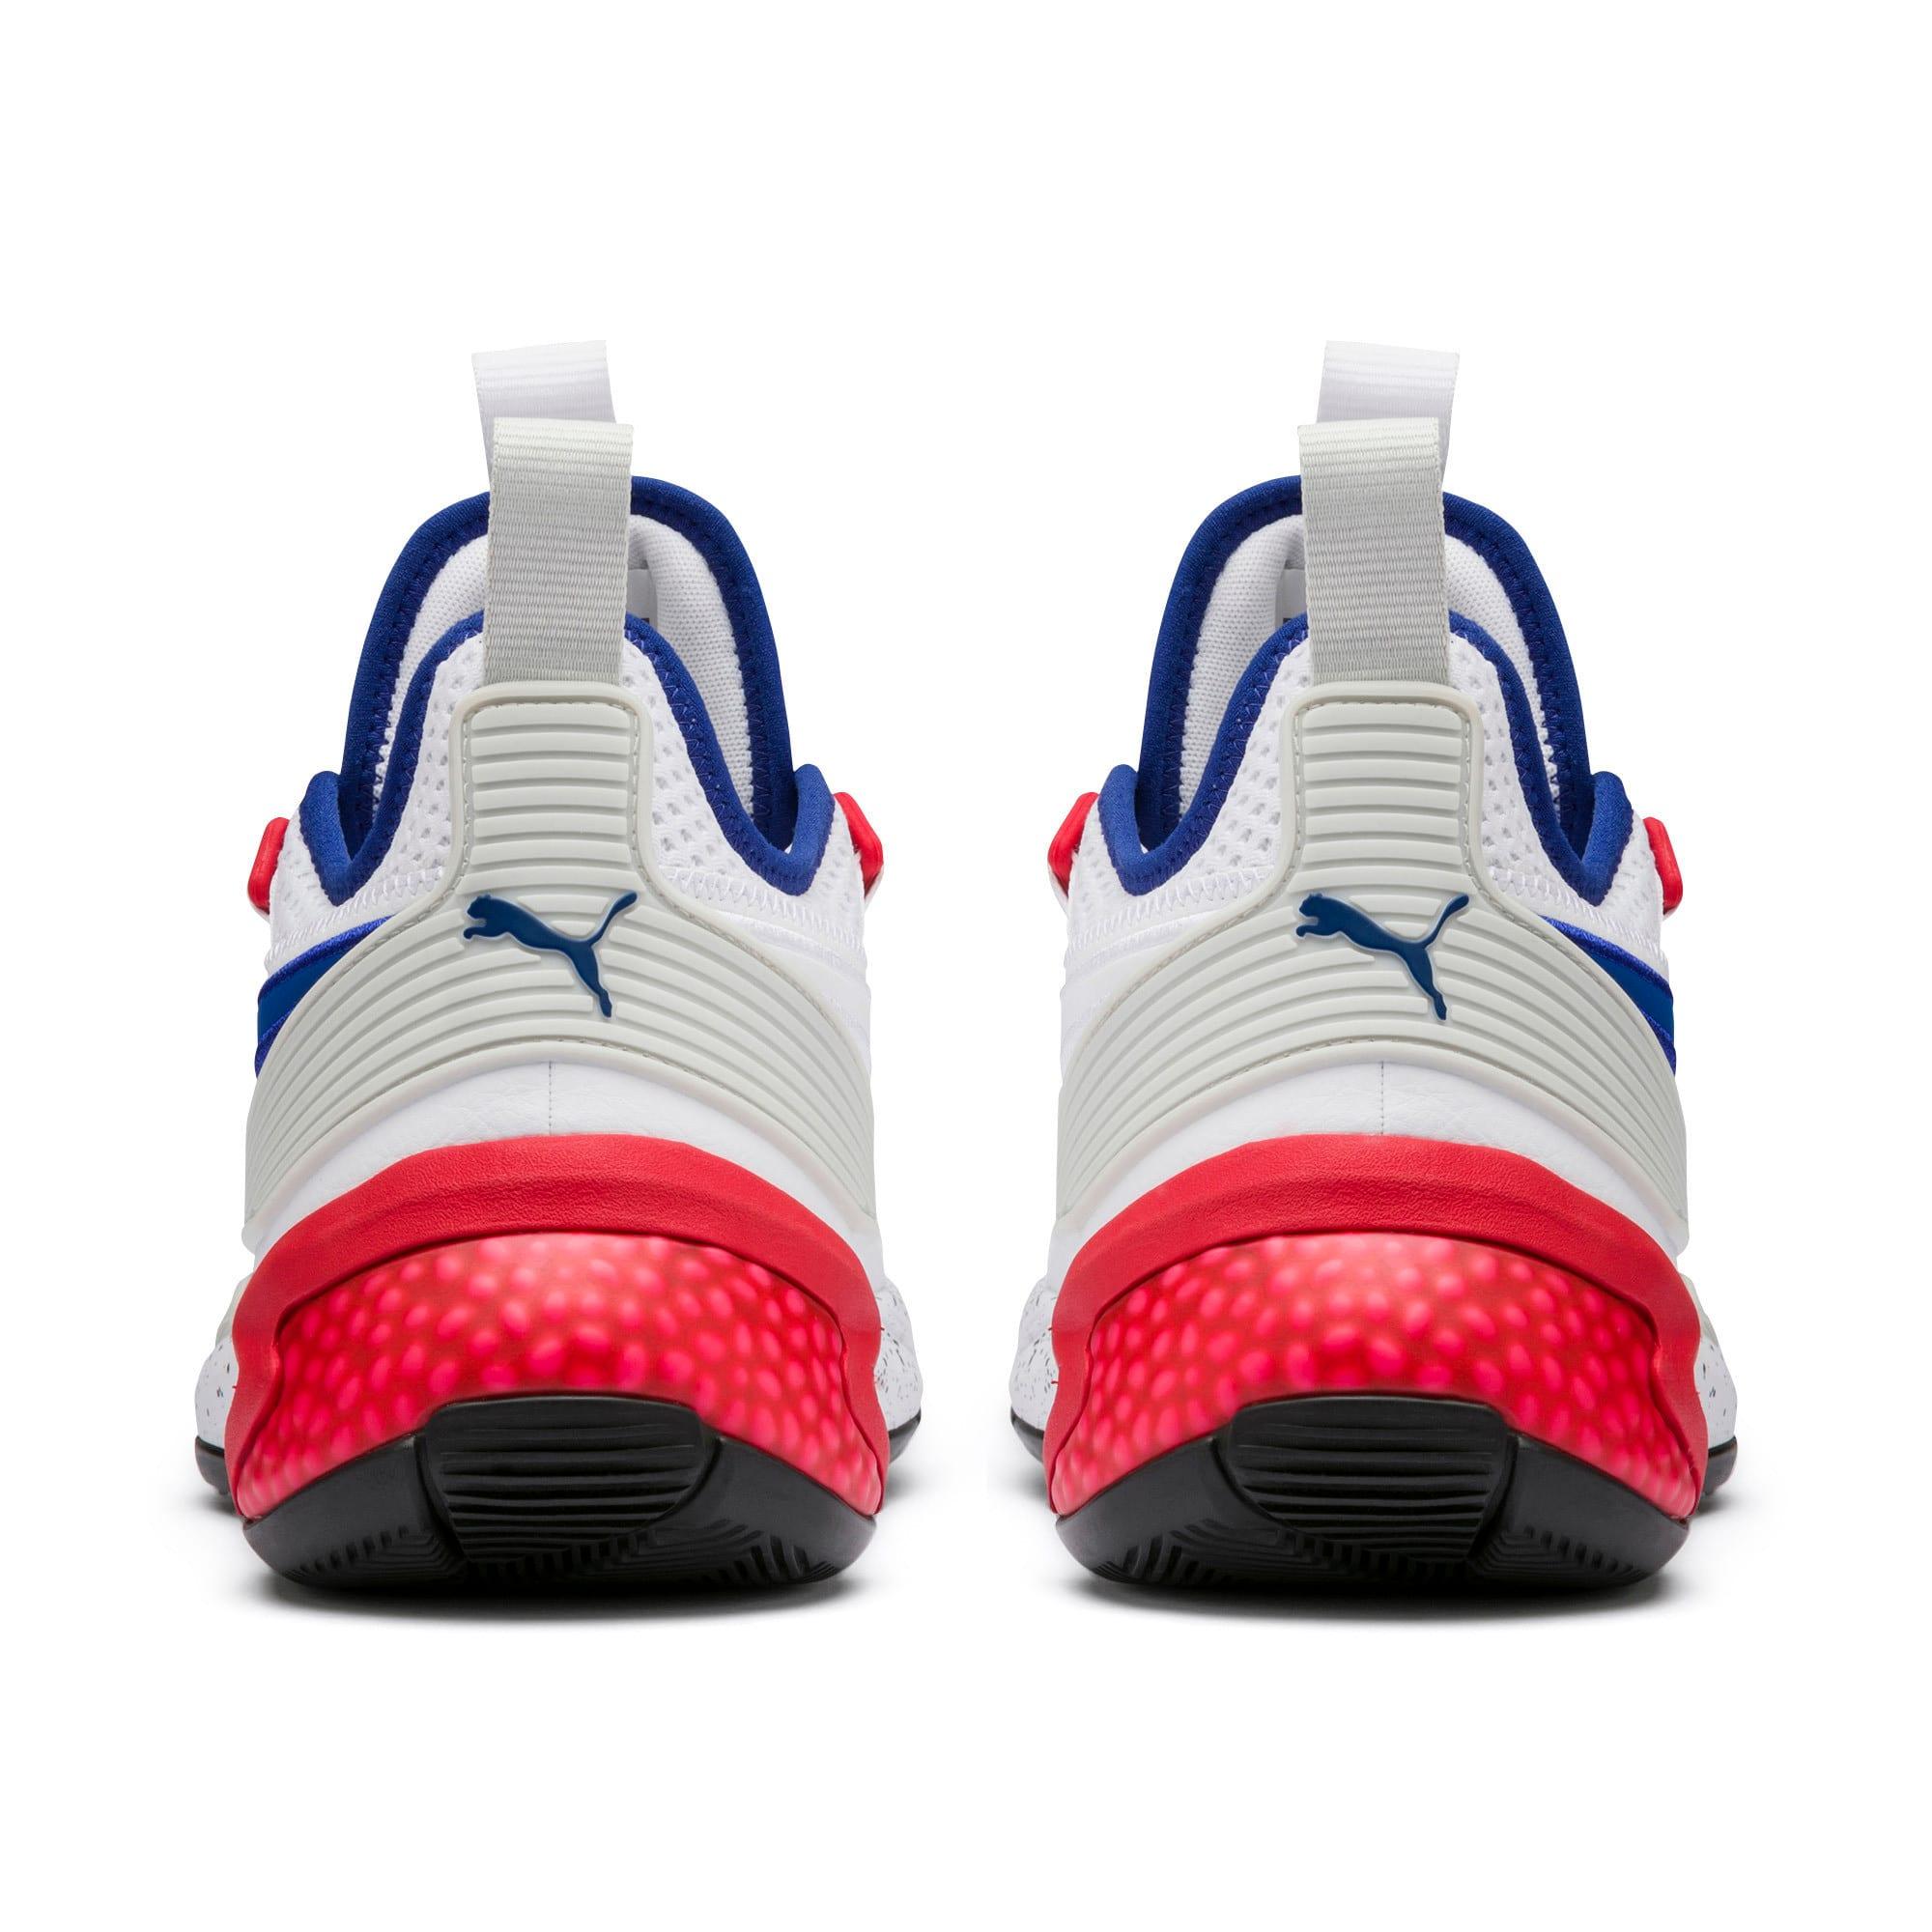 Thumbnail 3 of Uproar Palace Guard Basketball Shoes, Puma White-Surf The Web, medium